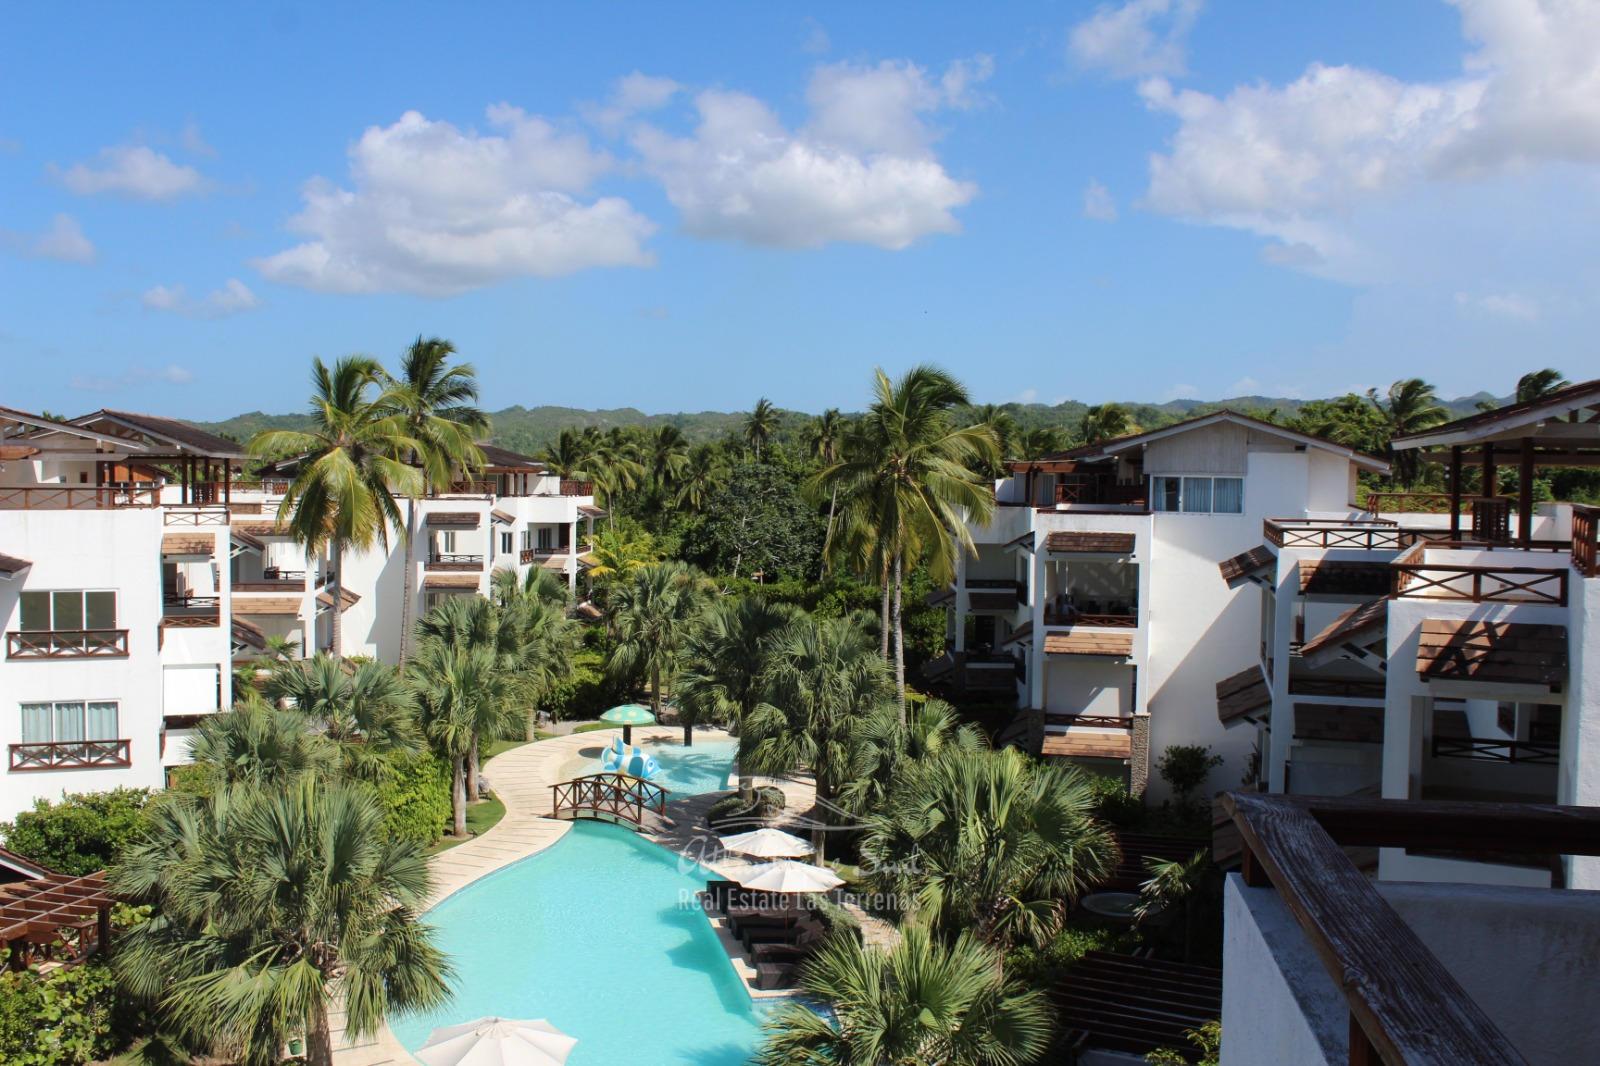 Apartments near the beach real estate las terrenas dominican republic 31 (10).jpg